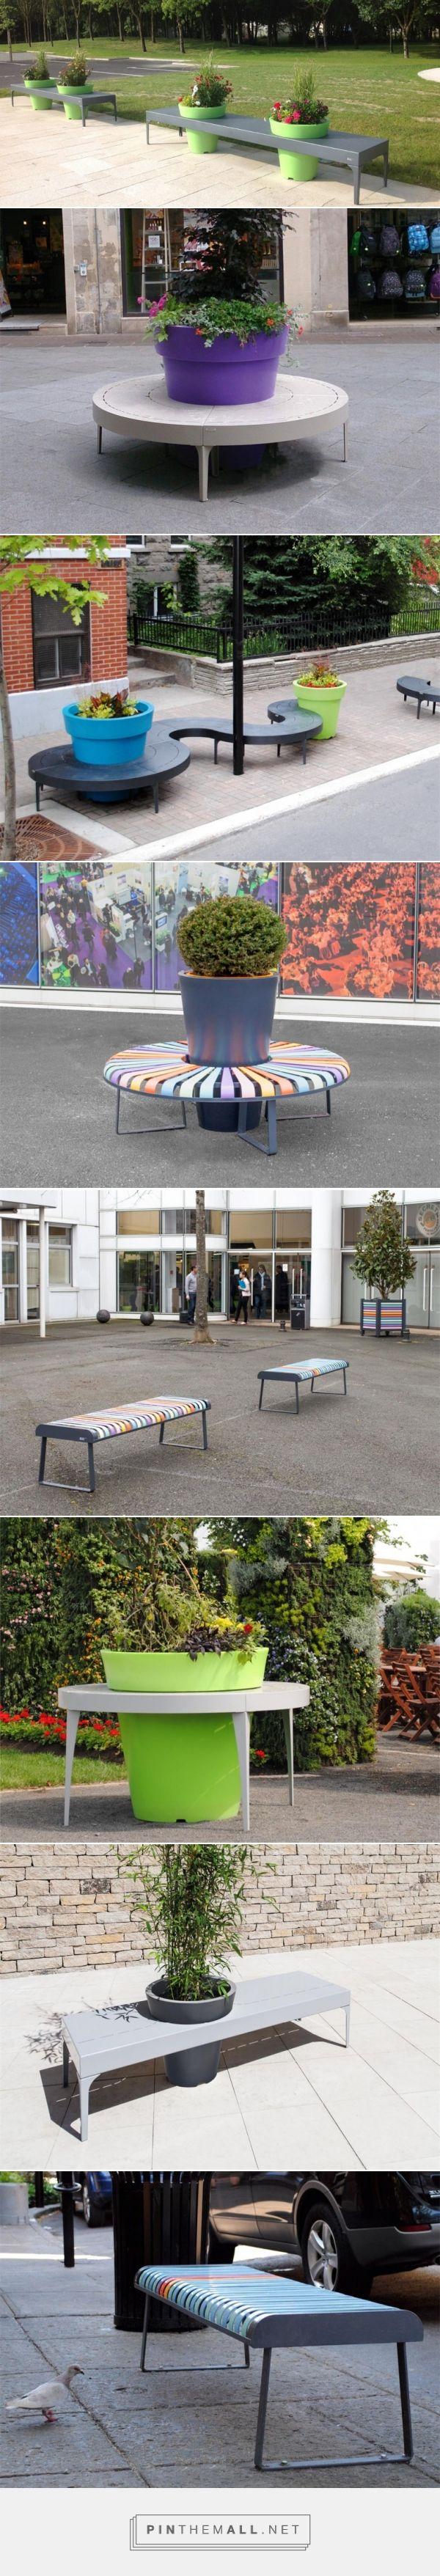 modern public furniture ideas | Inspirowani Naturą I atech-pl.eu